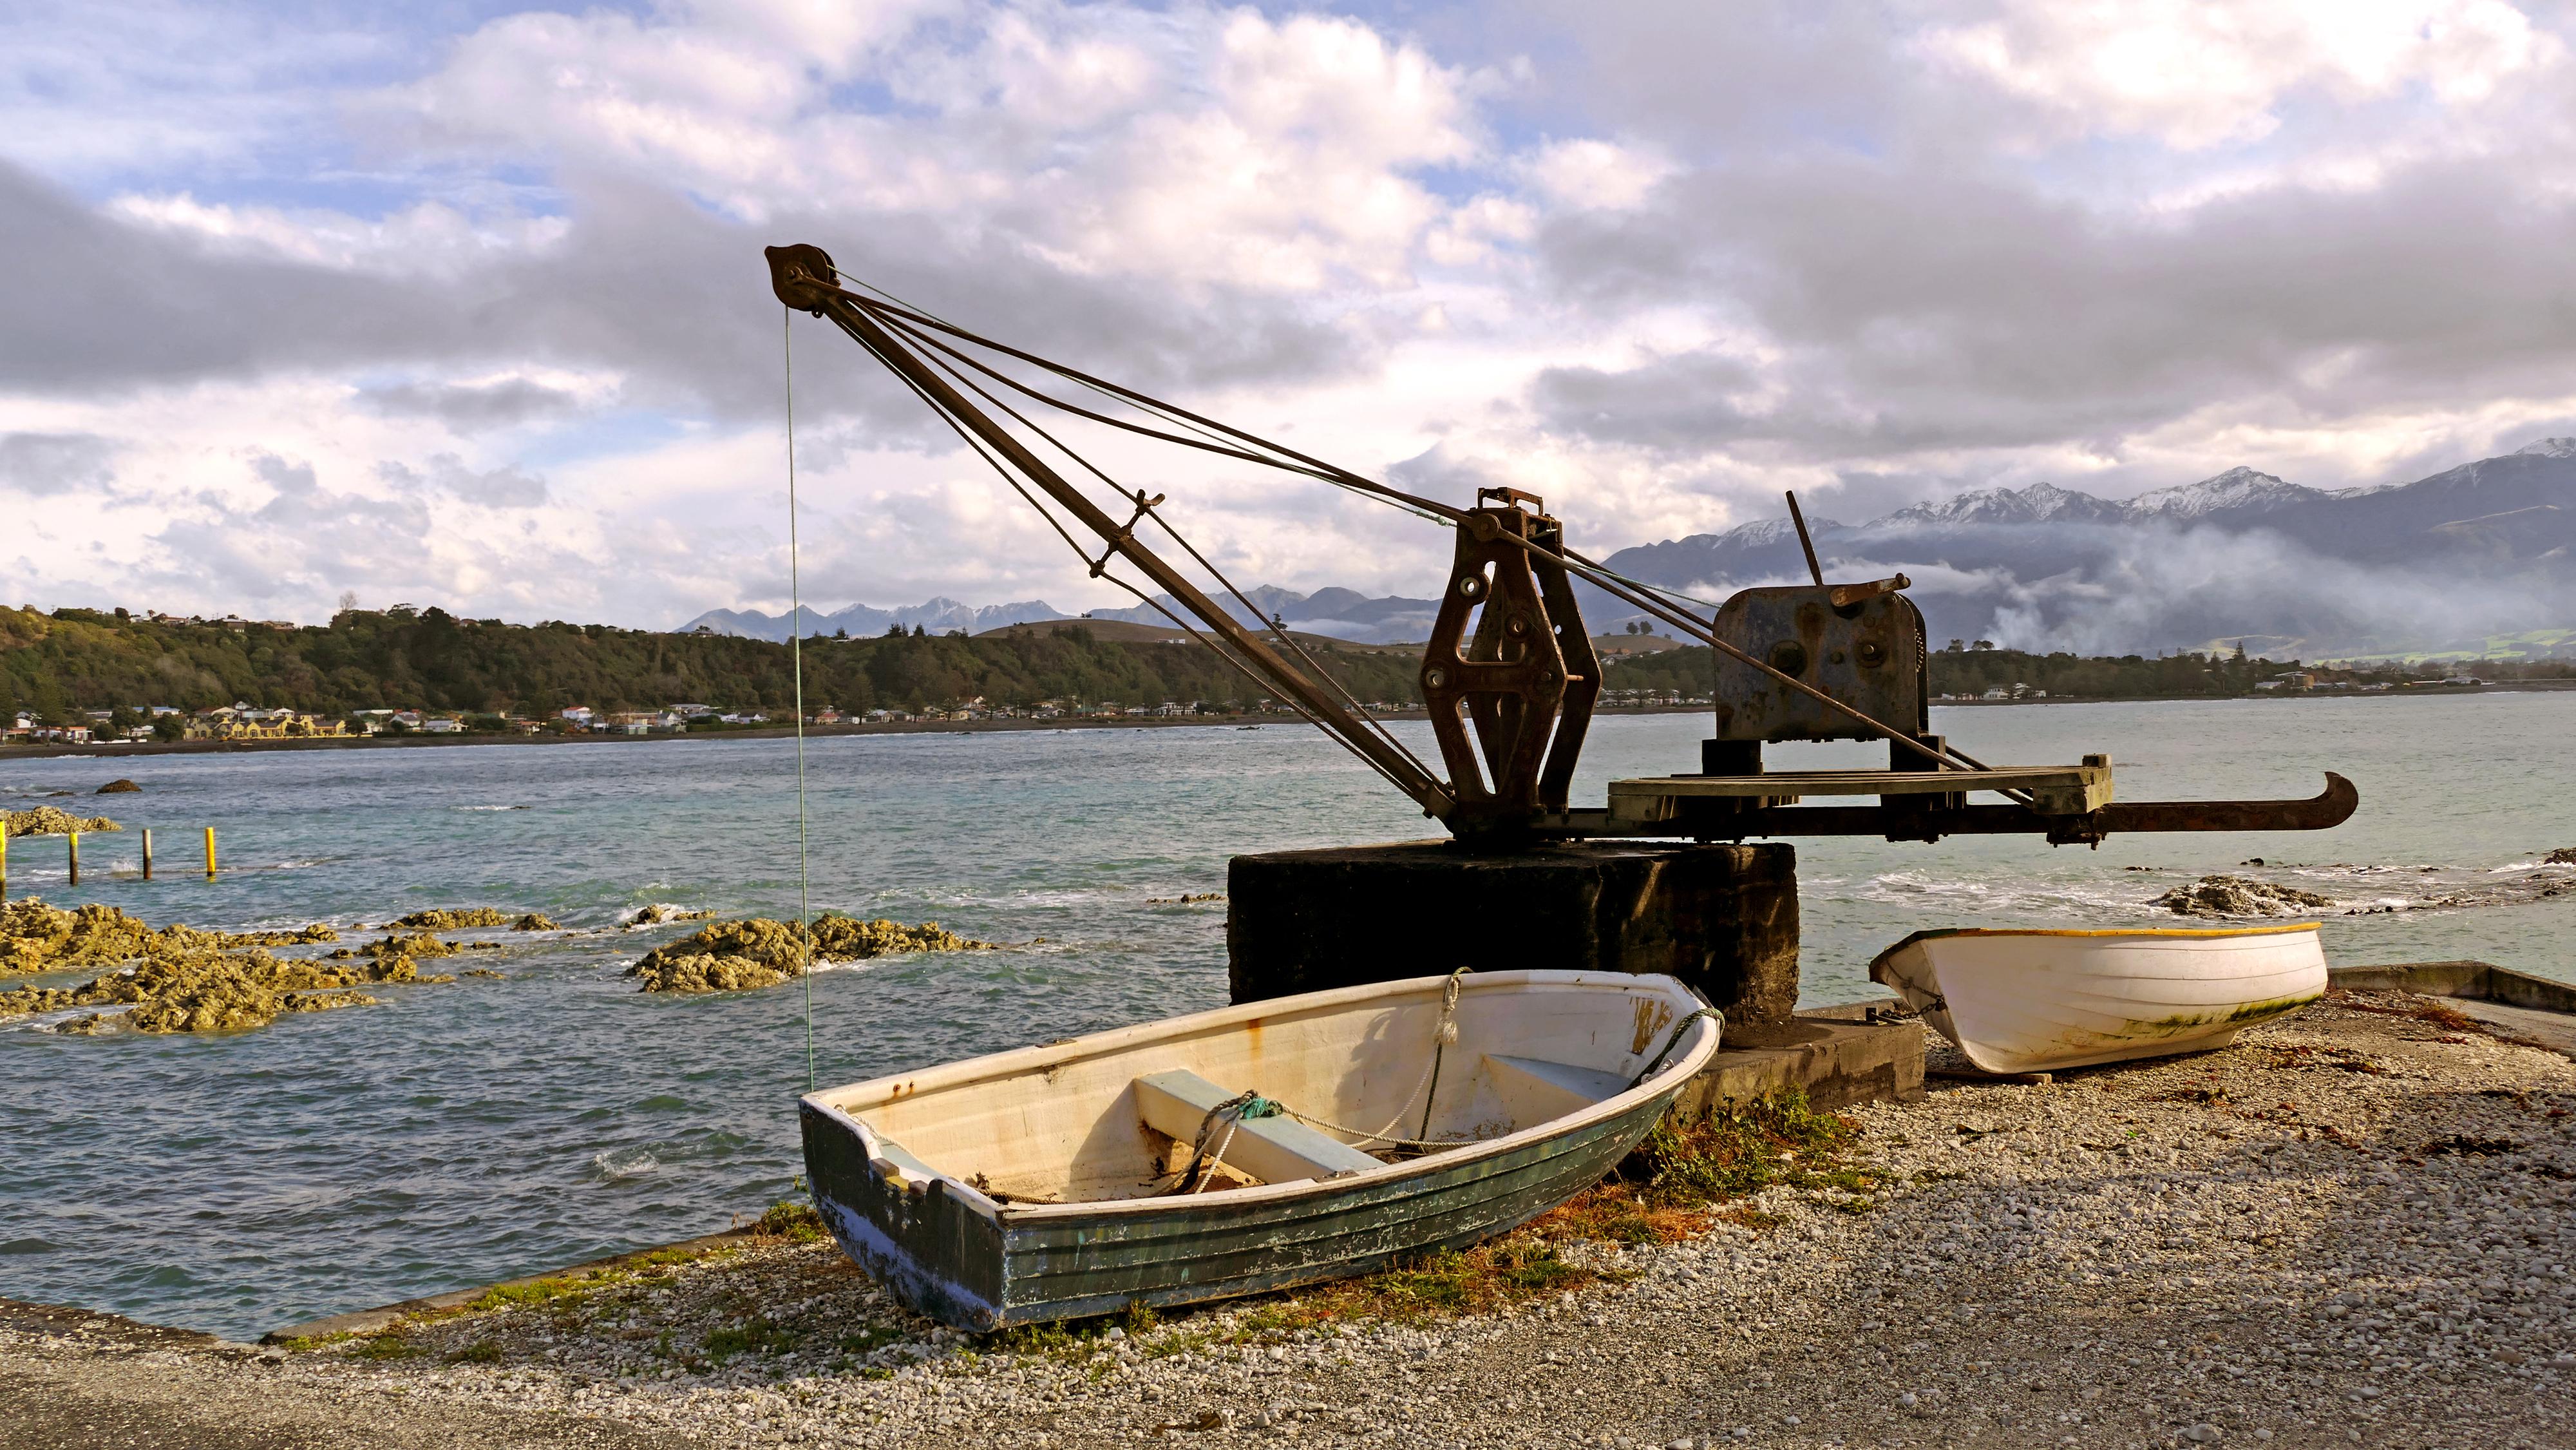 Boats Kaikoura. NZ, Boat, Bridge camera, Free photos, Harbour, HQ Photo